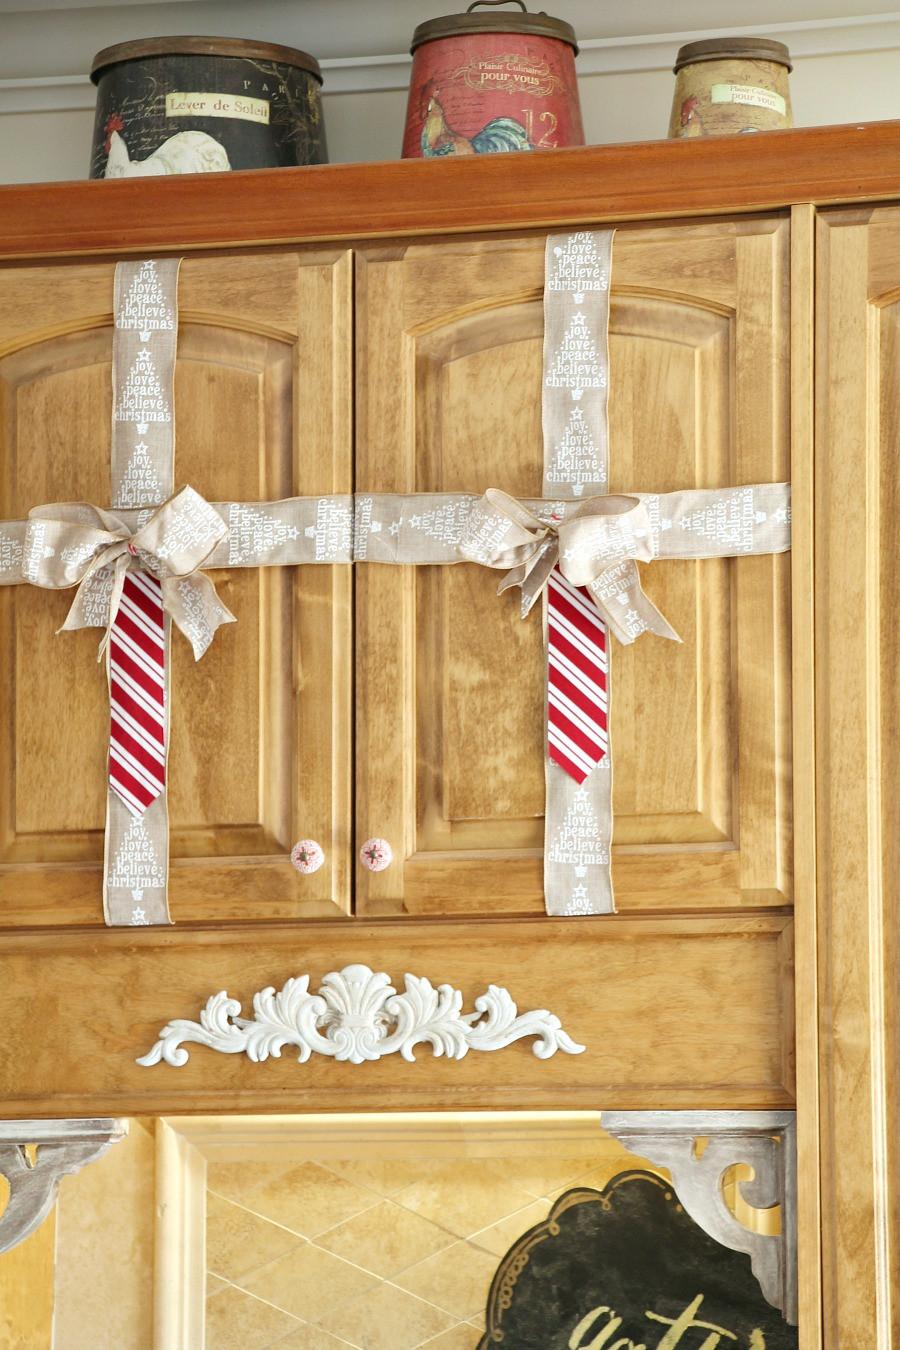 Kitchen Cabinet Christmas Decorating Ideas  Simple Christmas decorating ideas in the kitchen Debbiedoos